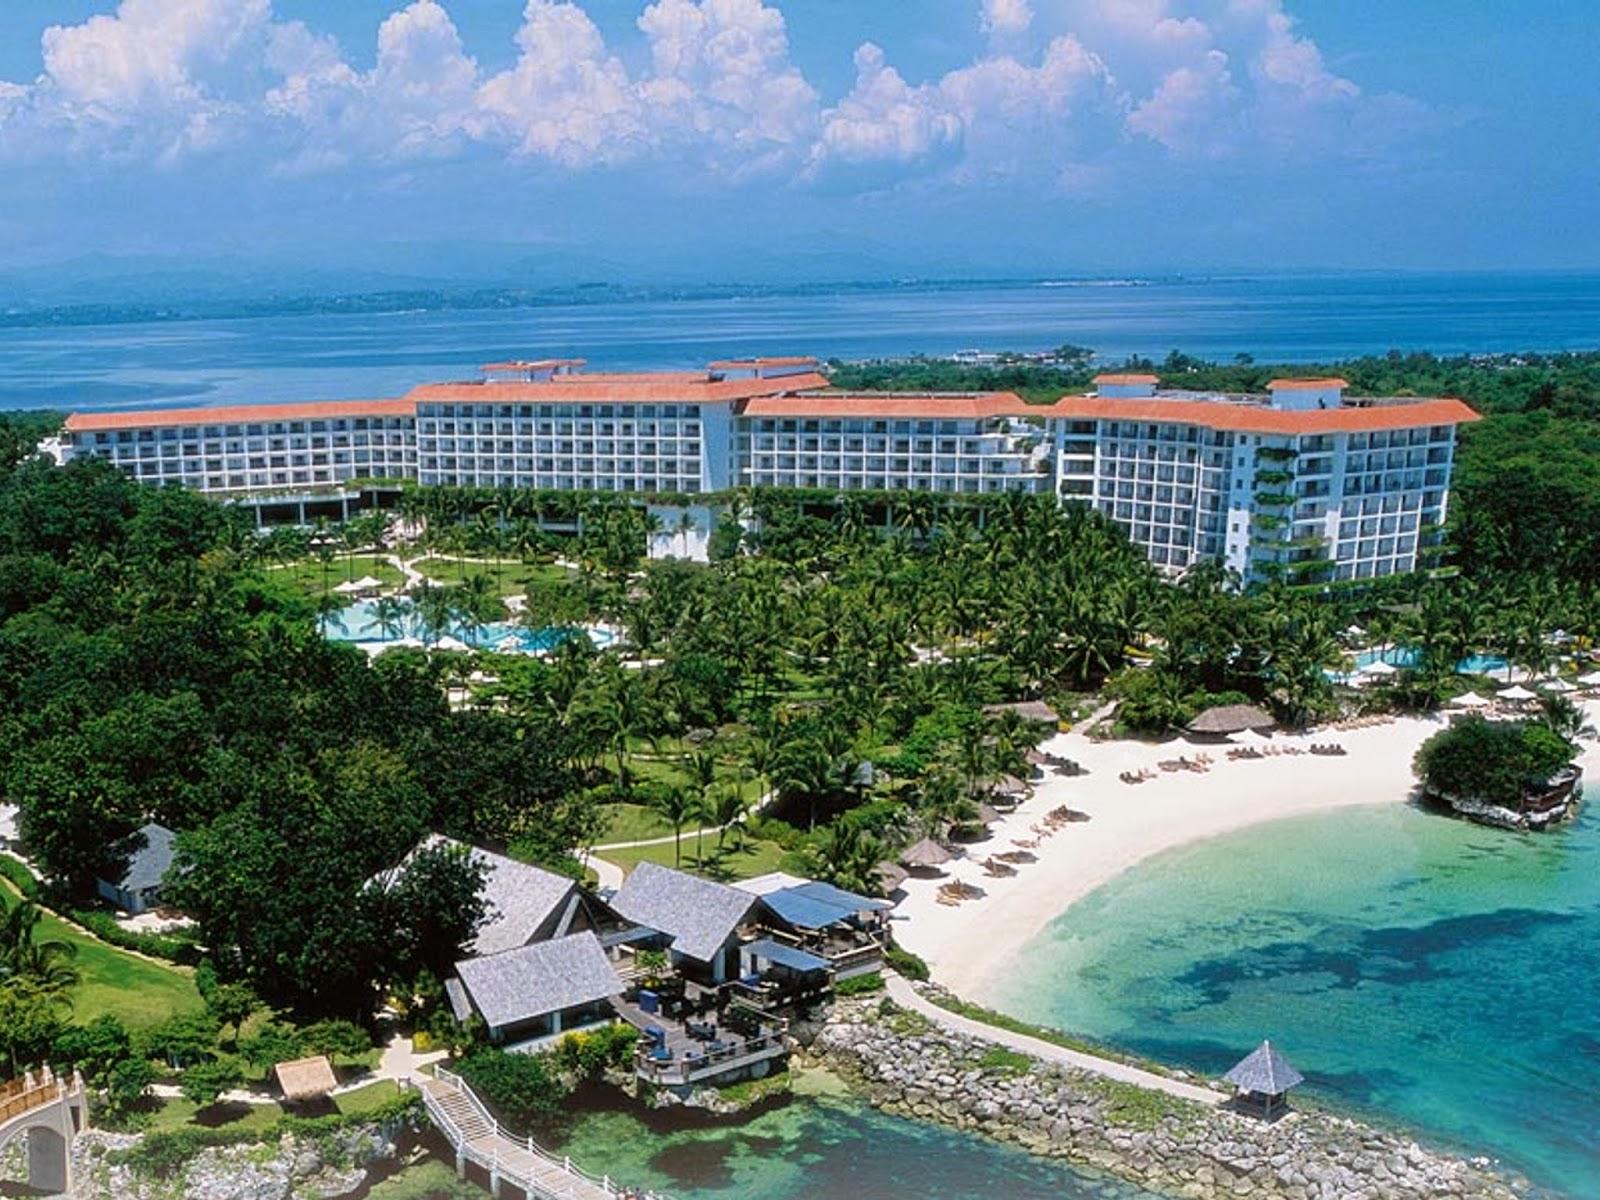 Best Hotel In The World Shangri La